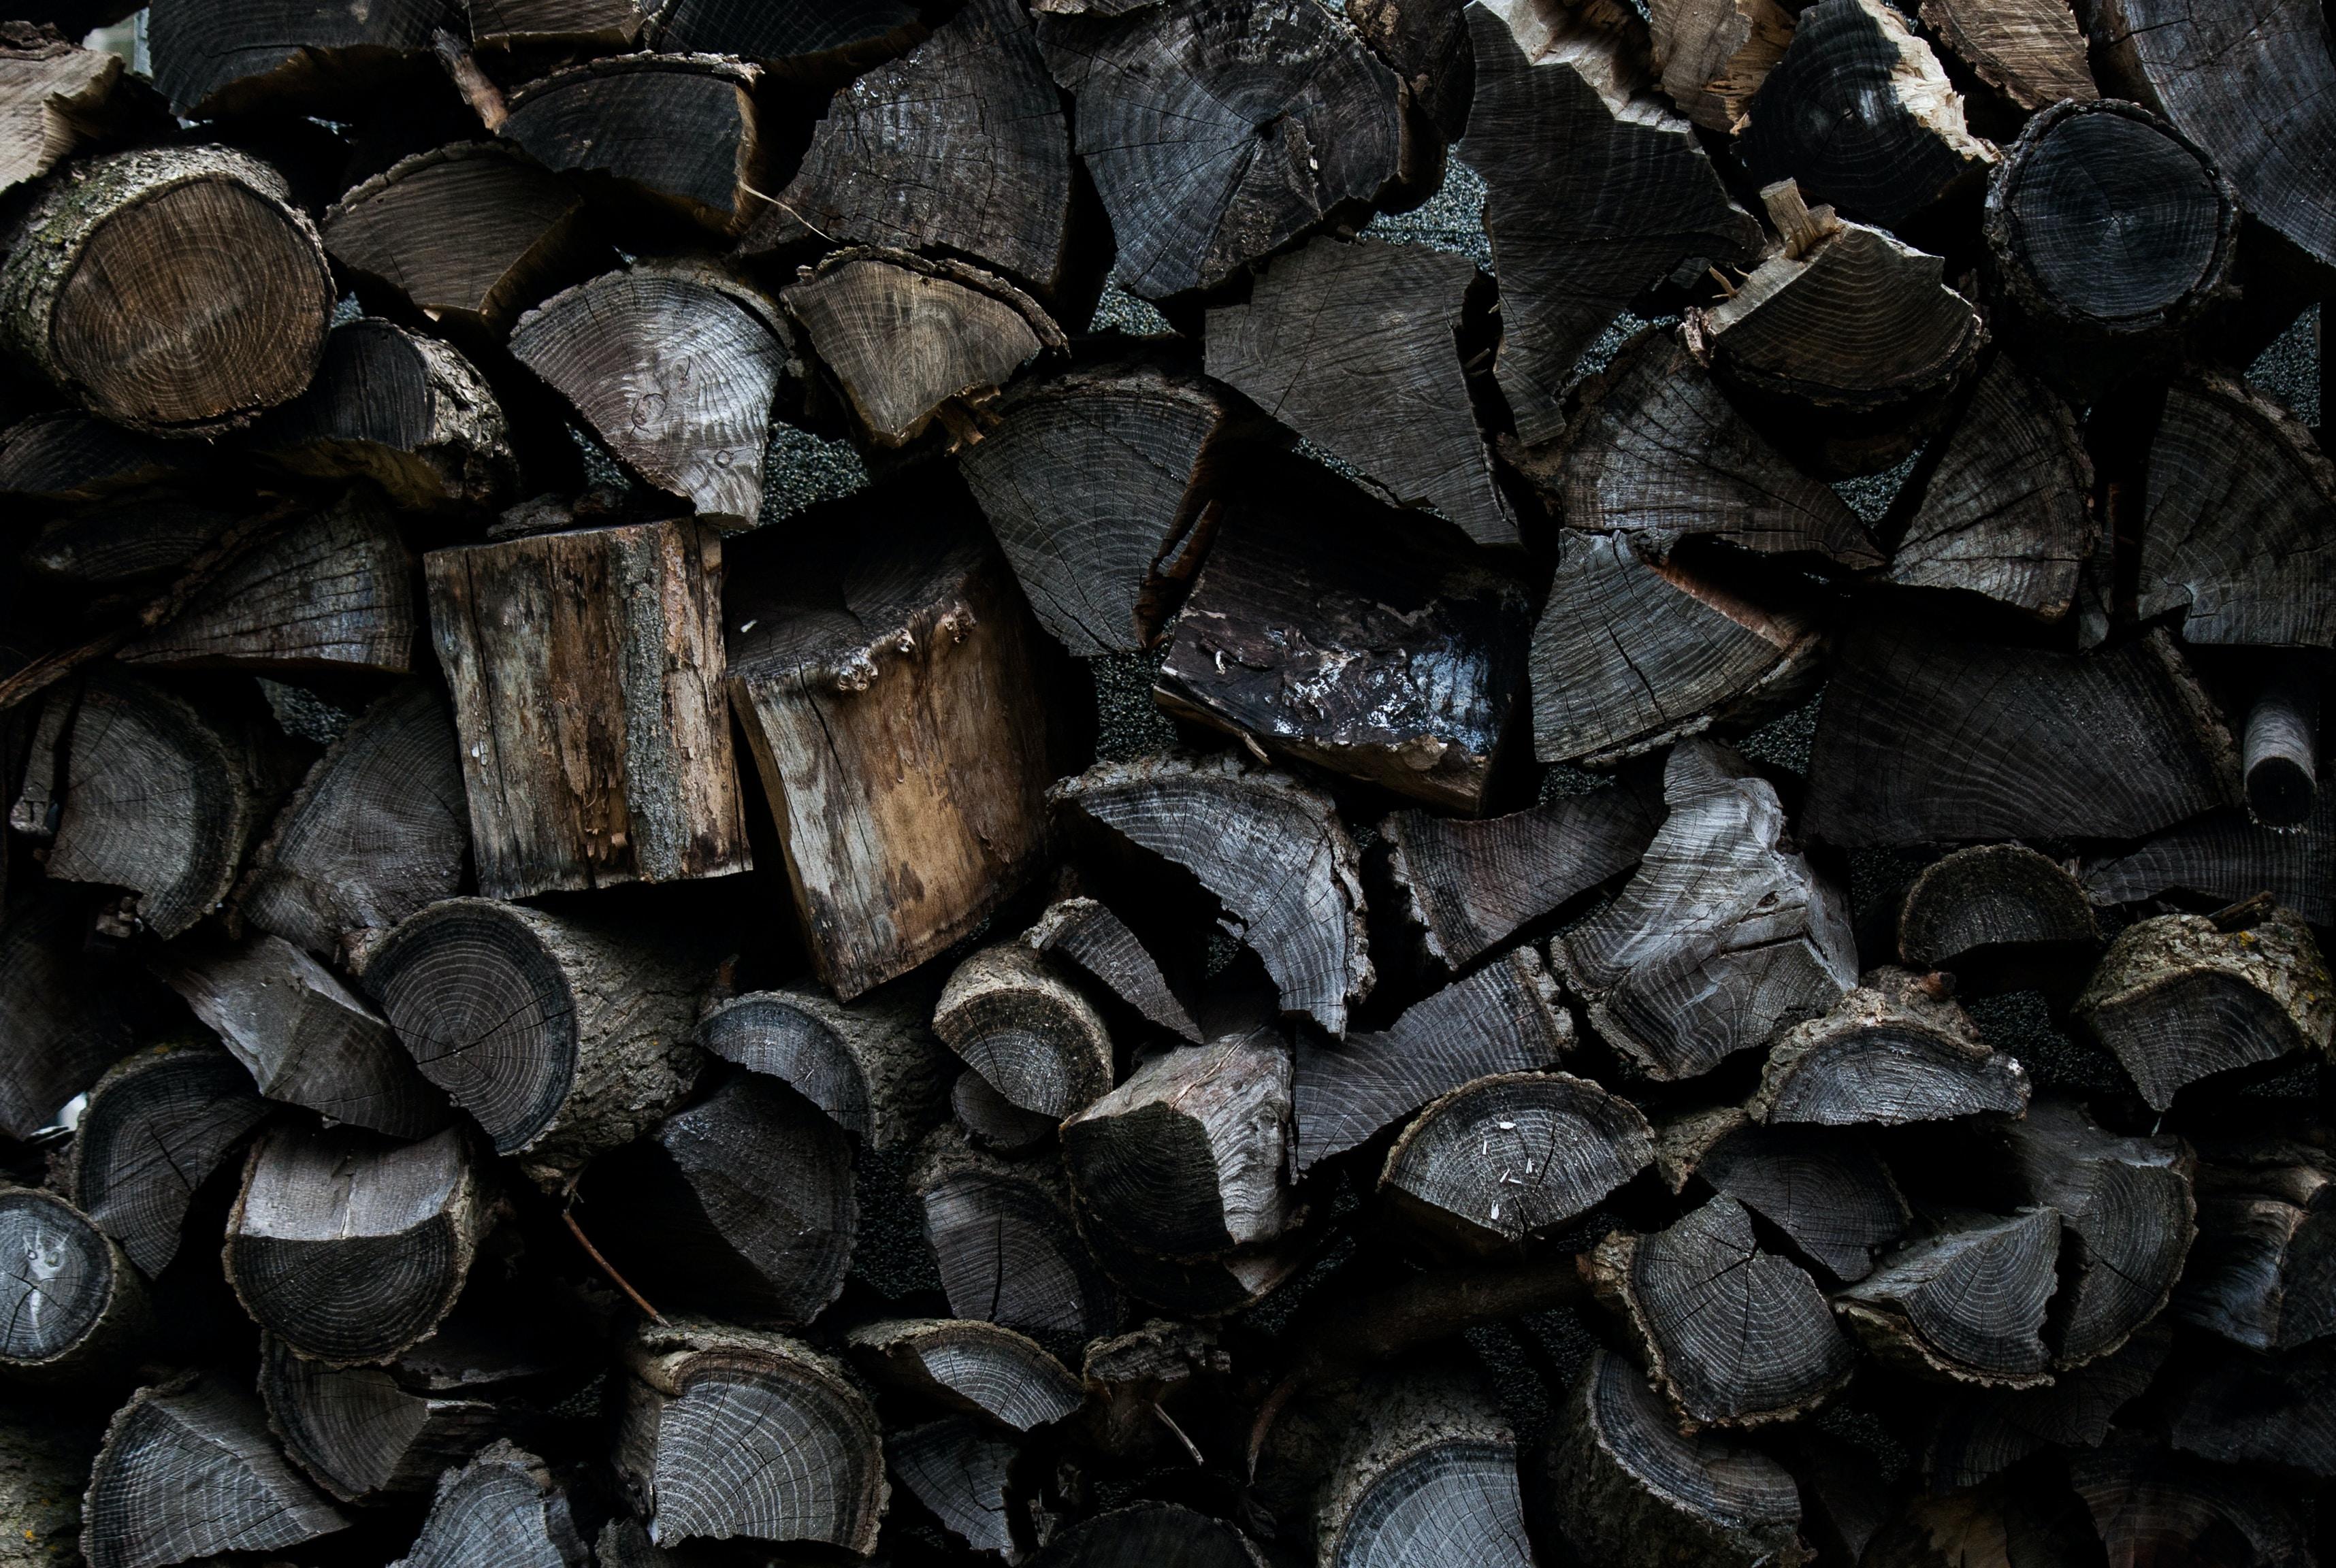 A pile of dark brown firewood